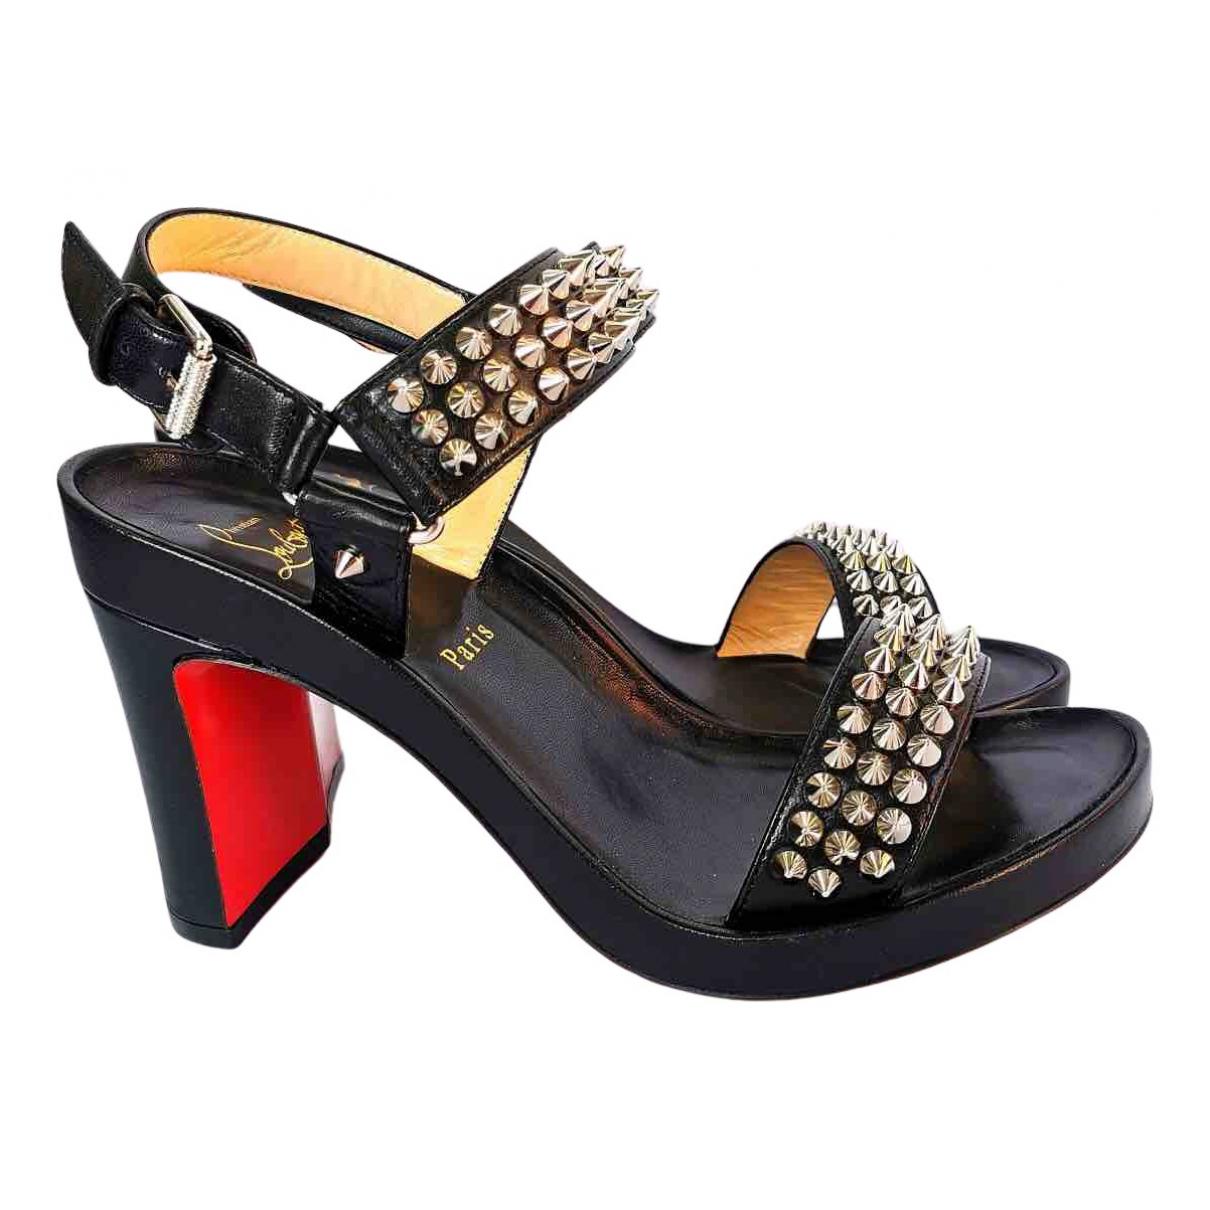 Christian Louboutin N Black Leather Sandals for Women 38.5 EU